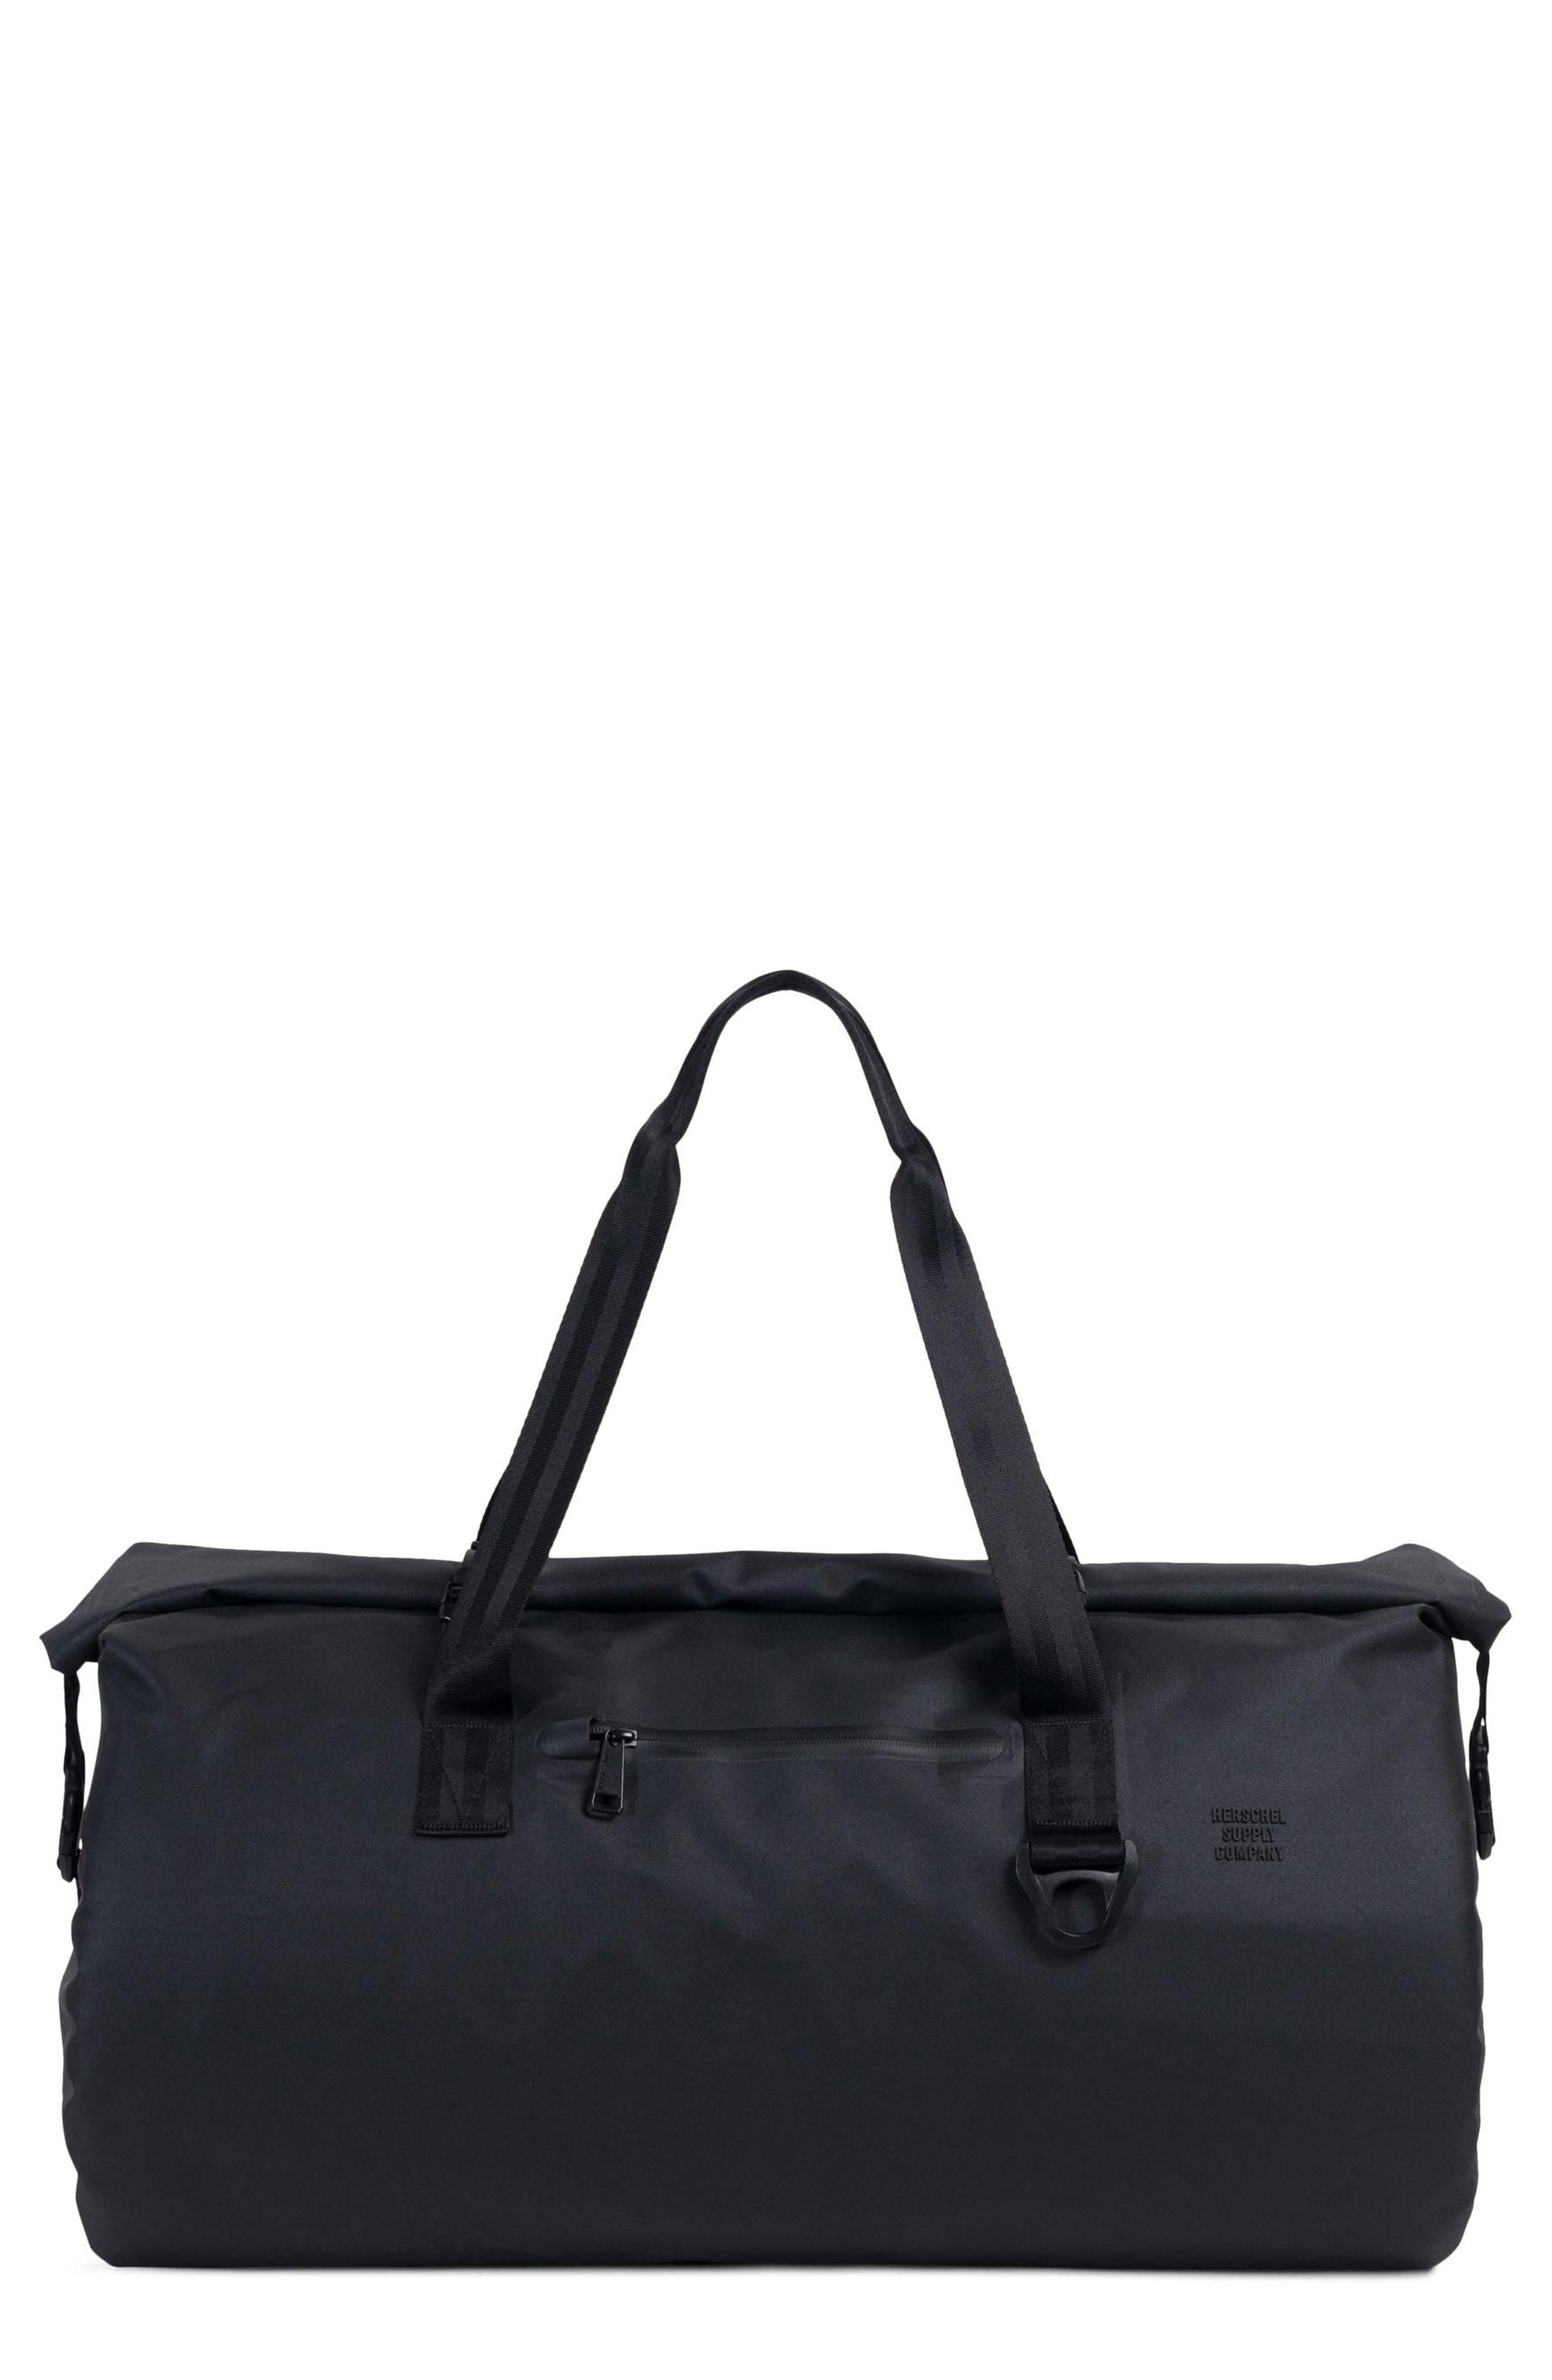 Tarpaulin Coast Studio Duffel Bag,                         Main,                         color, 001